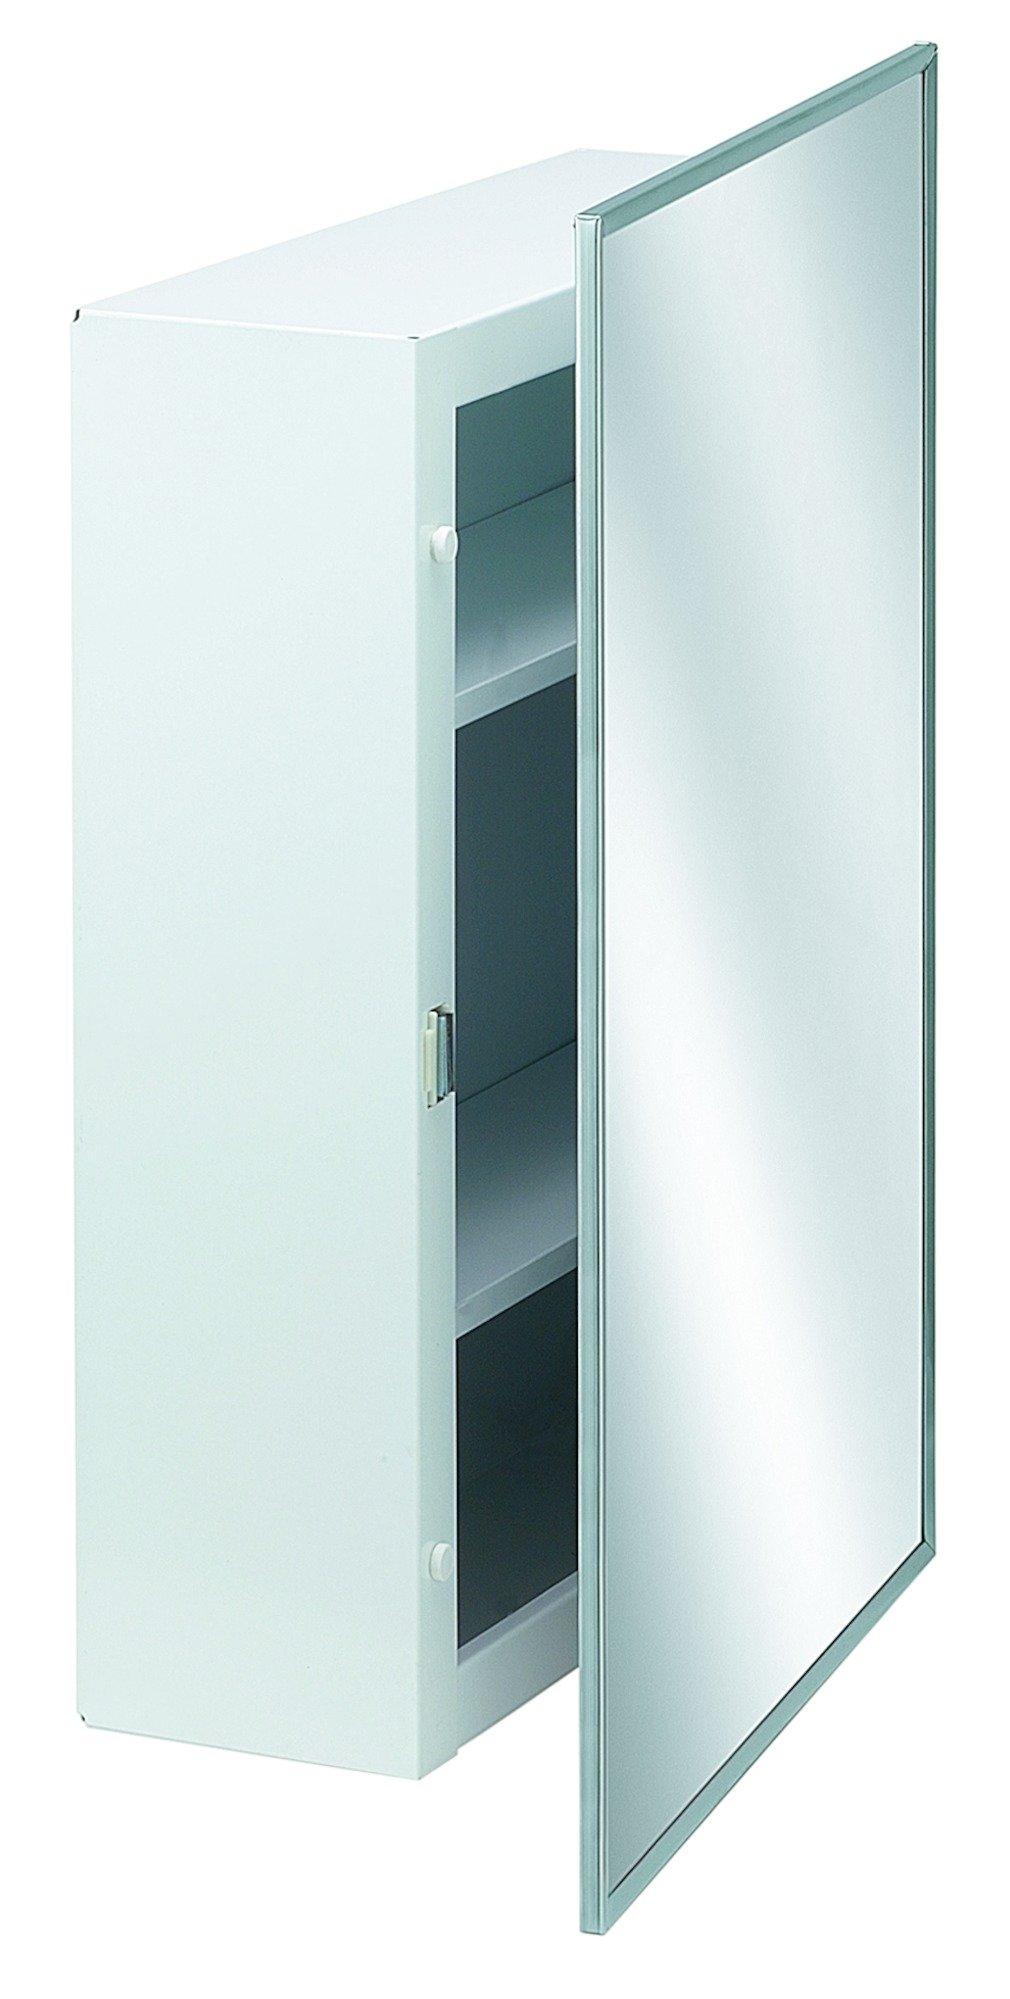 Medicine Cabinets 9661-000000 - Accurate Door & Hardware, Inc